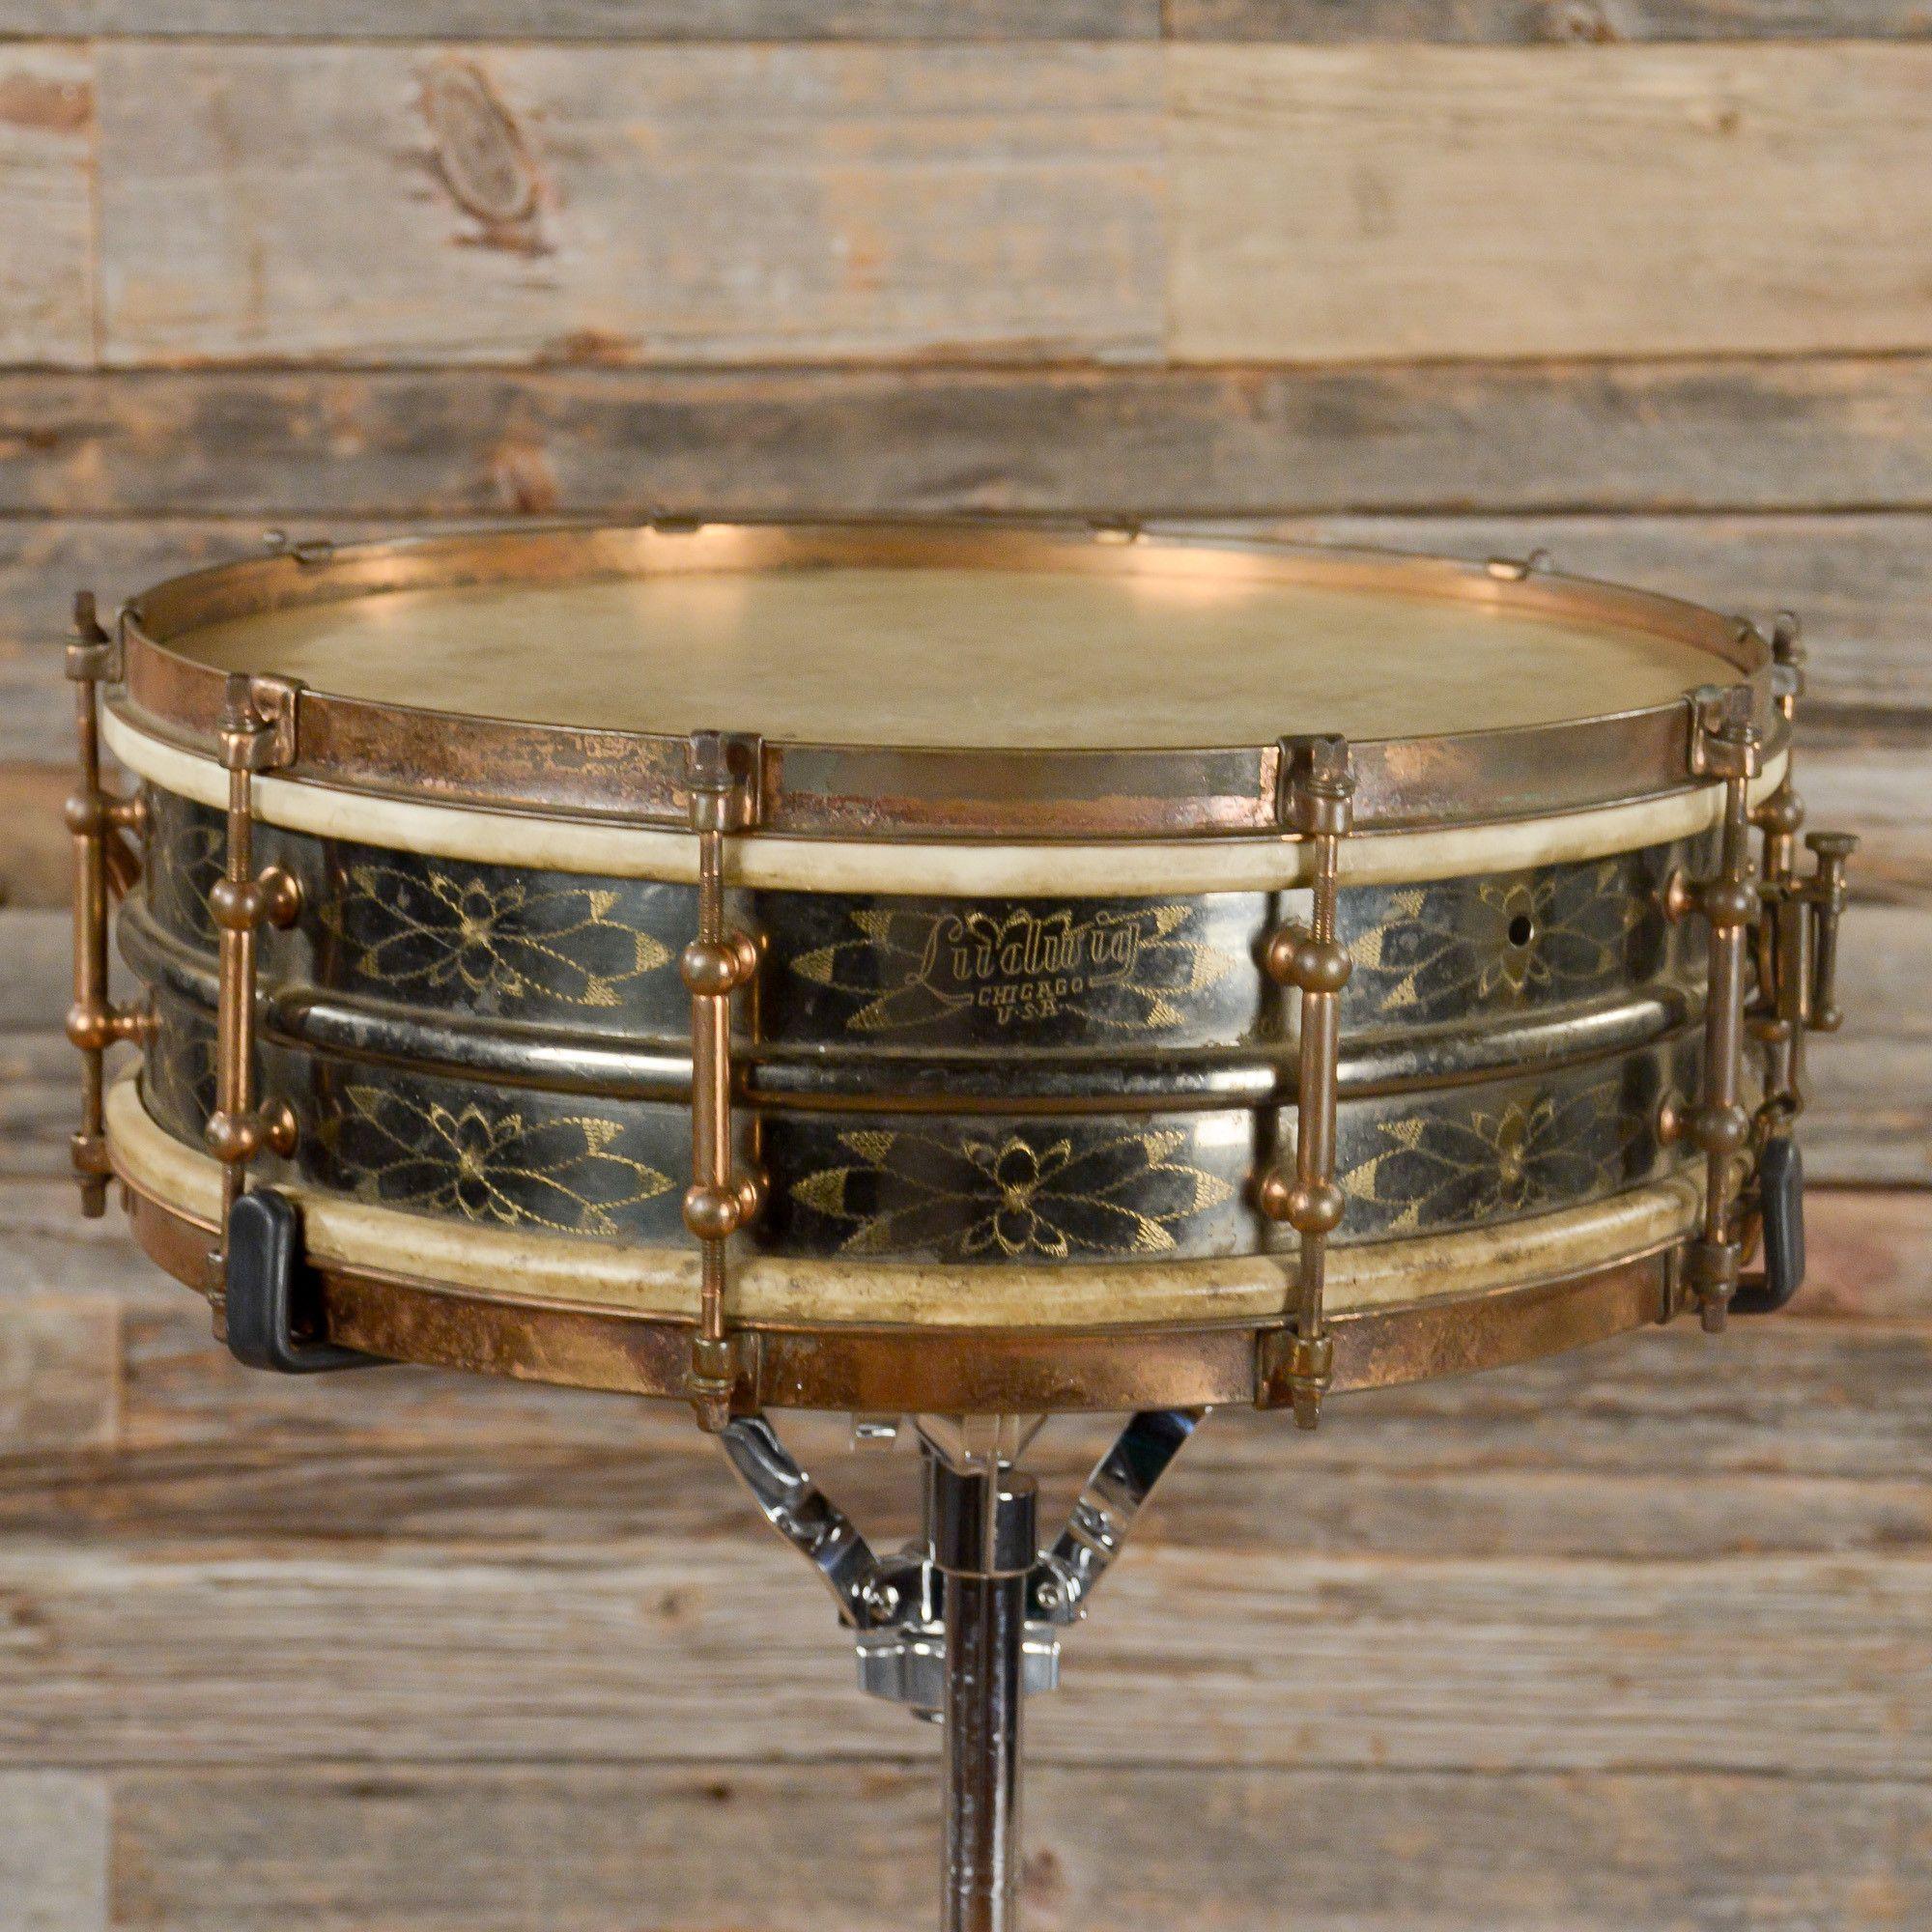 Ludwig 5x15 Black Beauty Snare Drum 1920s | Music / Gear | Pinterest ...